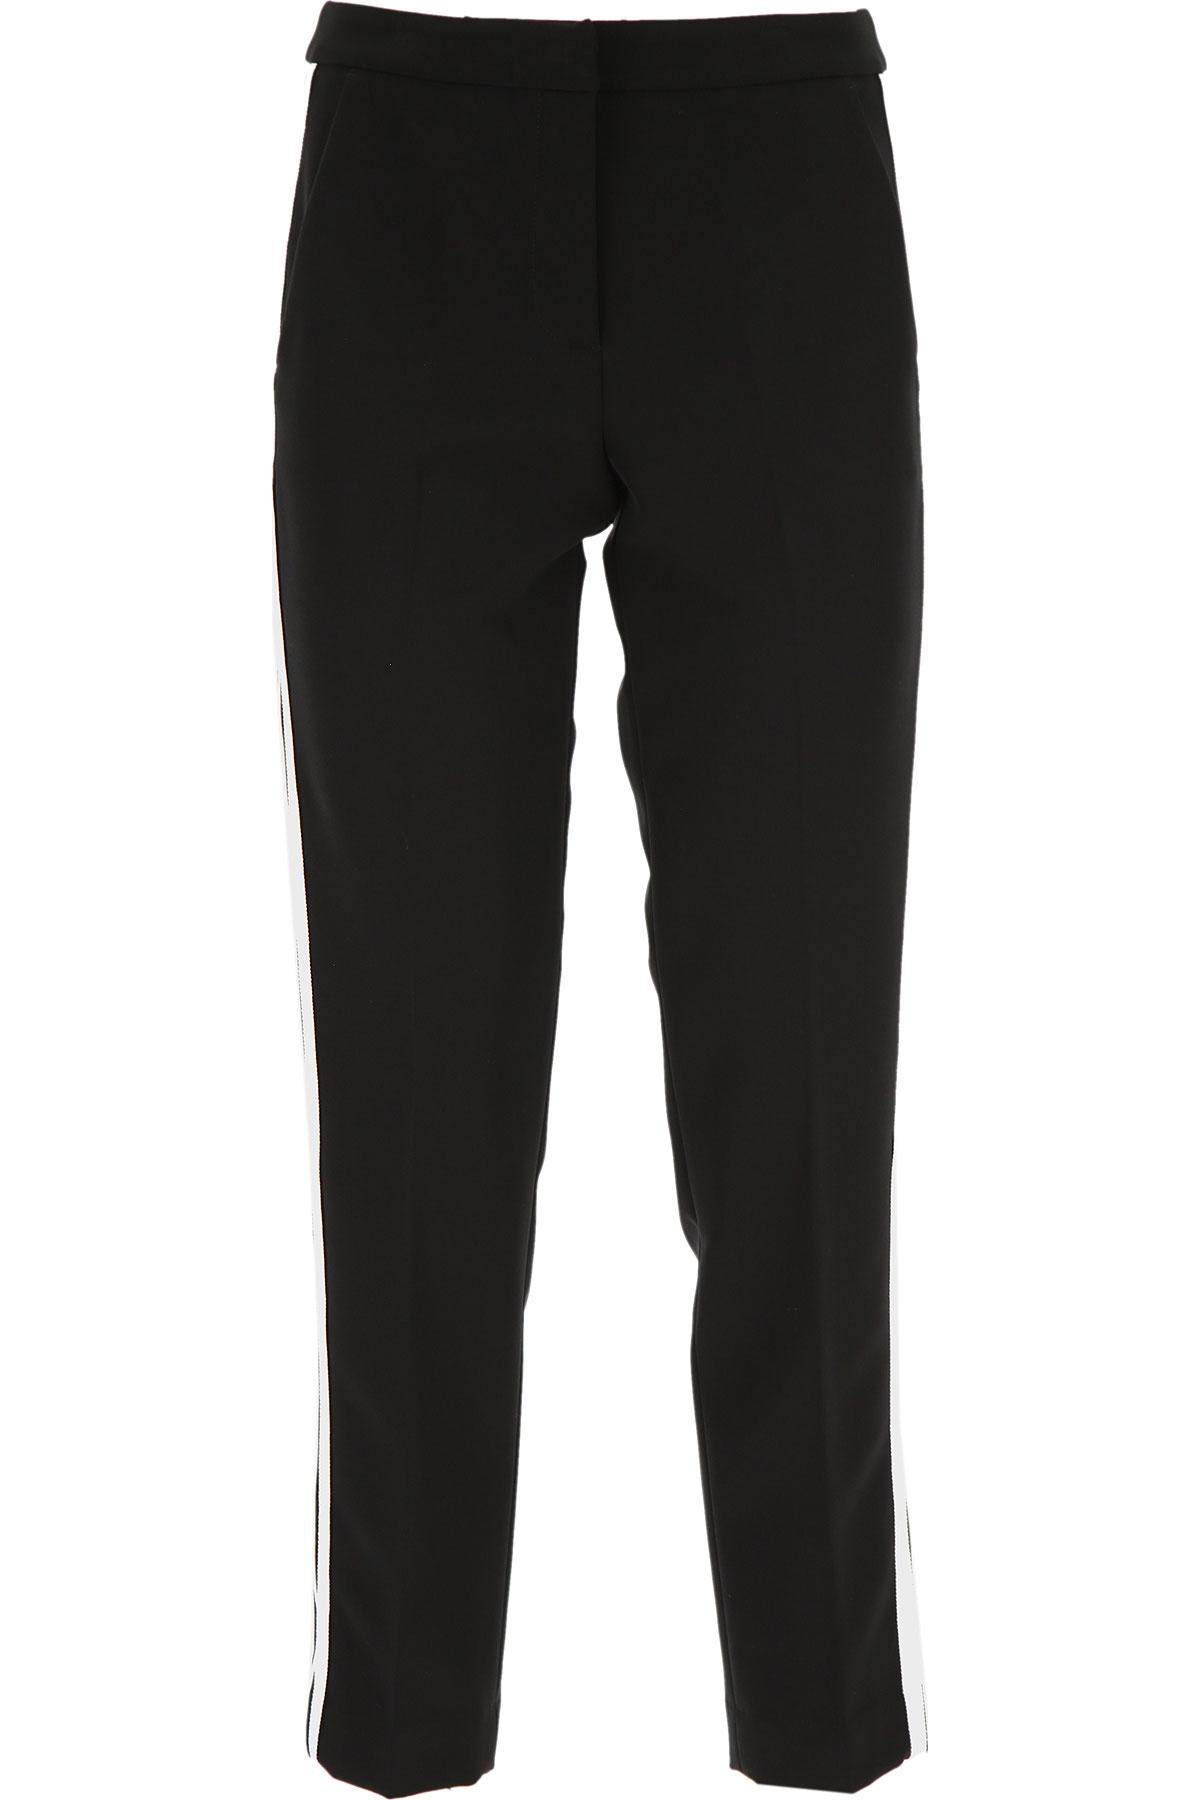 Ermanno Scervino Pants for Women On Sale, Black, polyester, 2019, 4 6 8